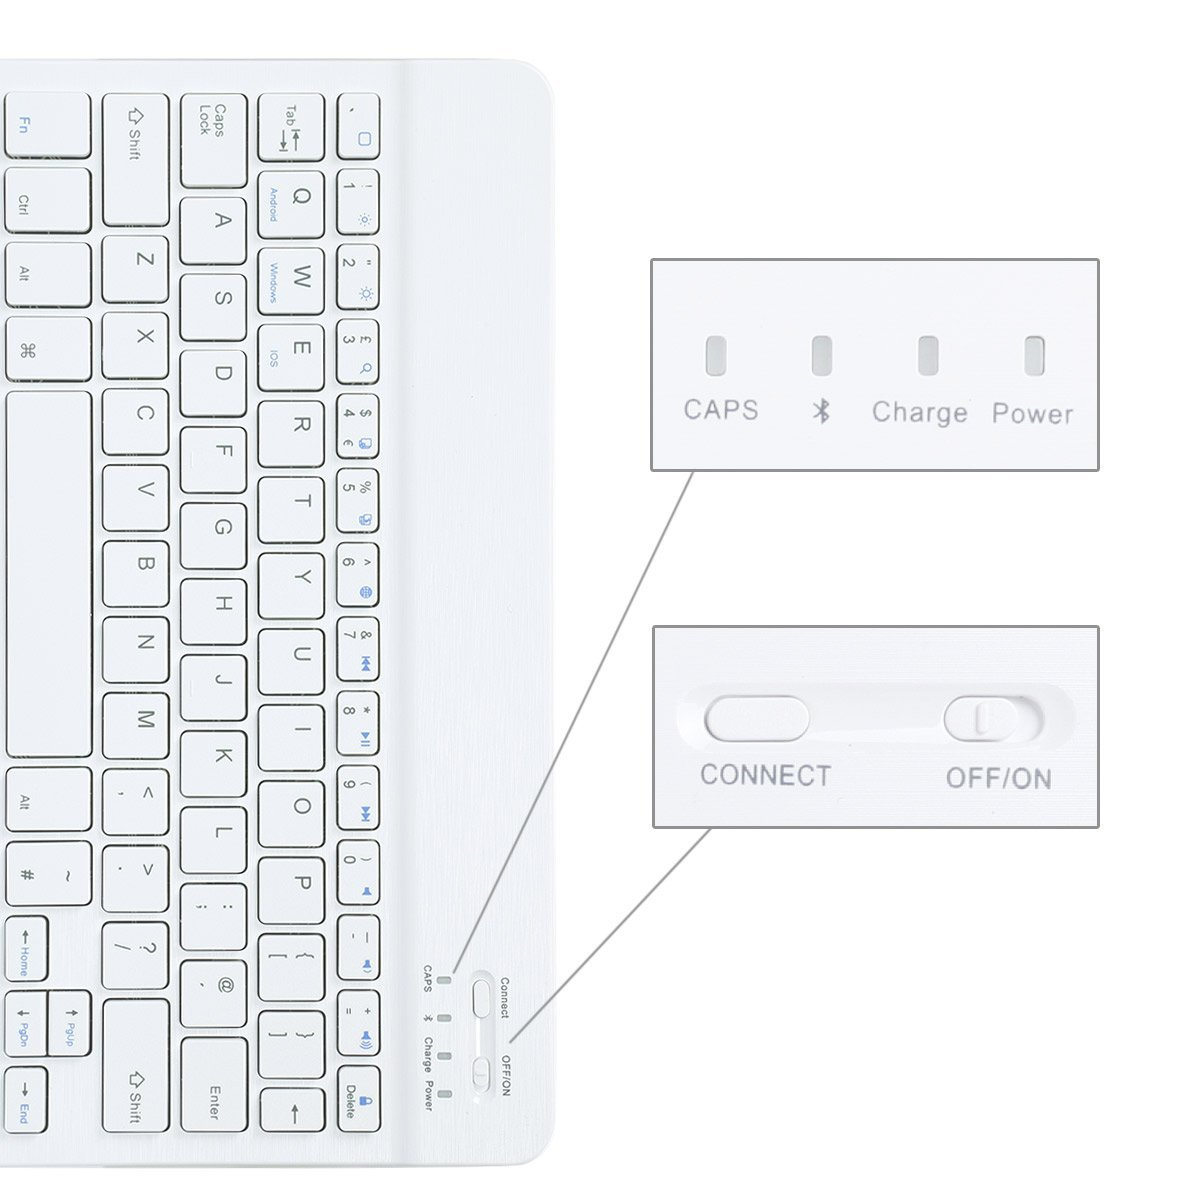 CoastaCloud Portable 10-inch Ultra Slim ABS Wireless Bluetooth Keyboard for iPad 10.5, iPad 9.7'', iPad Pro, iPad Air, iPad 2/3/4, Galaxy Tab Note and Any iOS, Android, Windows Tablets (White) by CoastaCloud (Image #3)